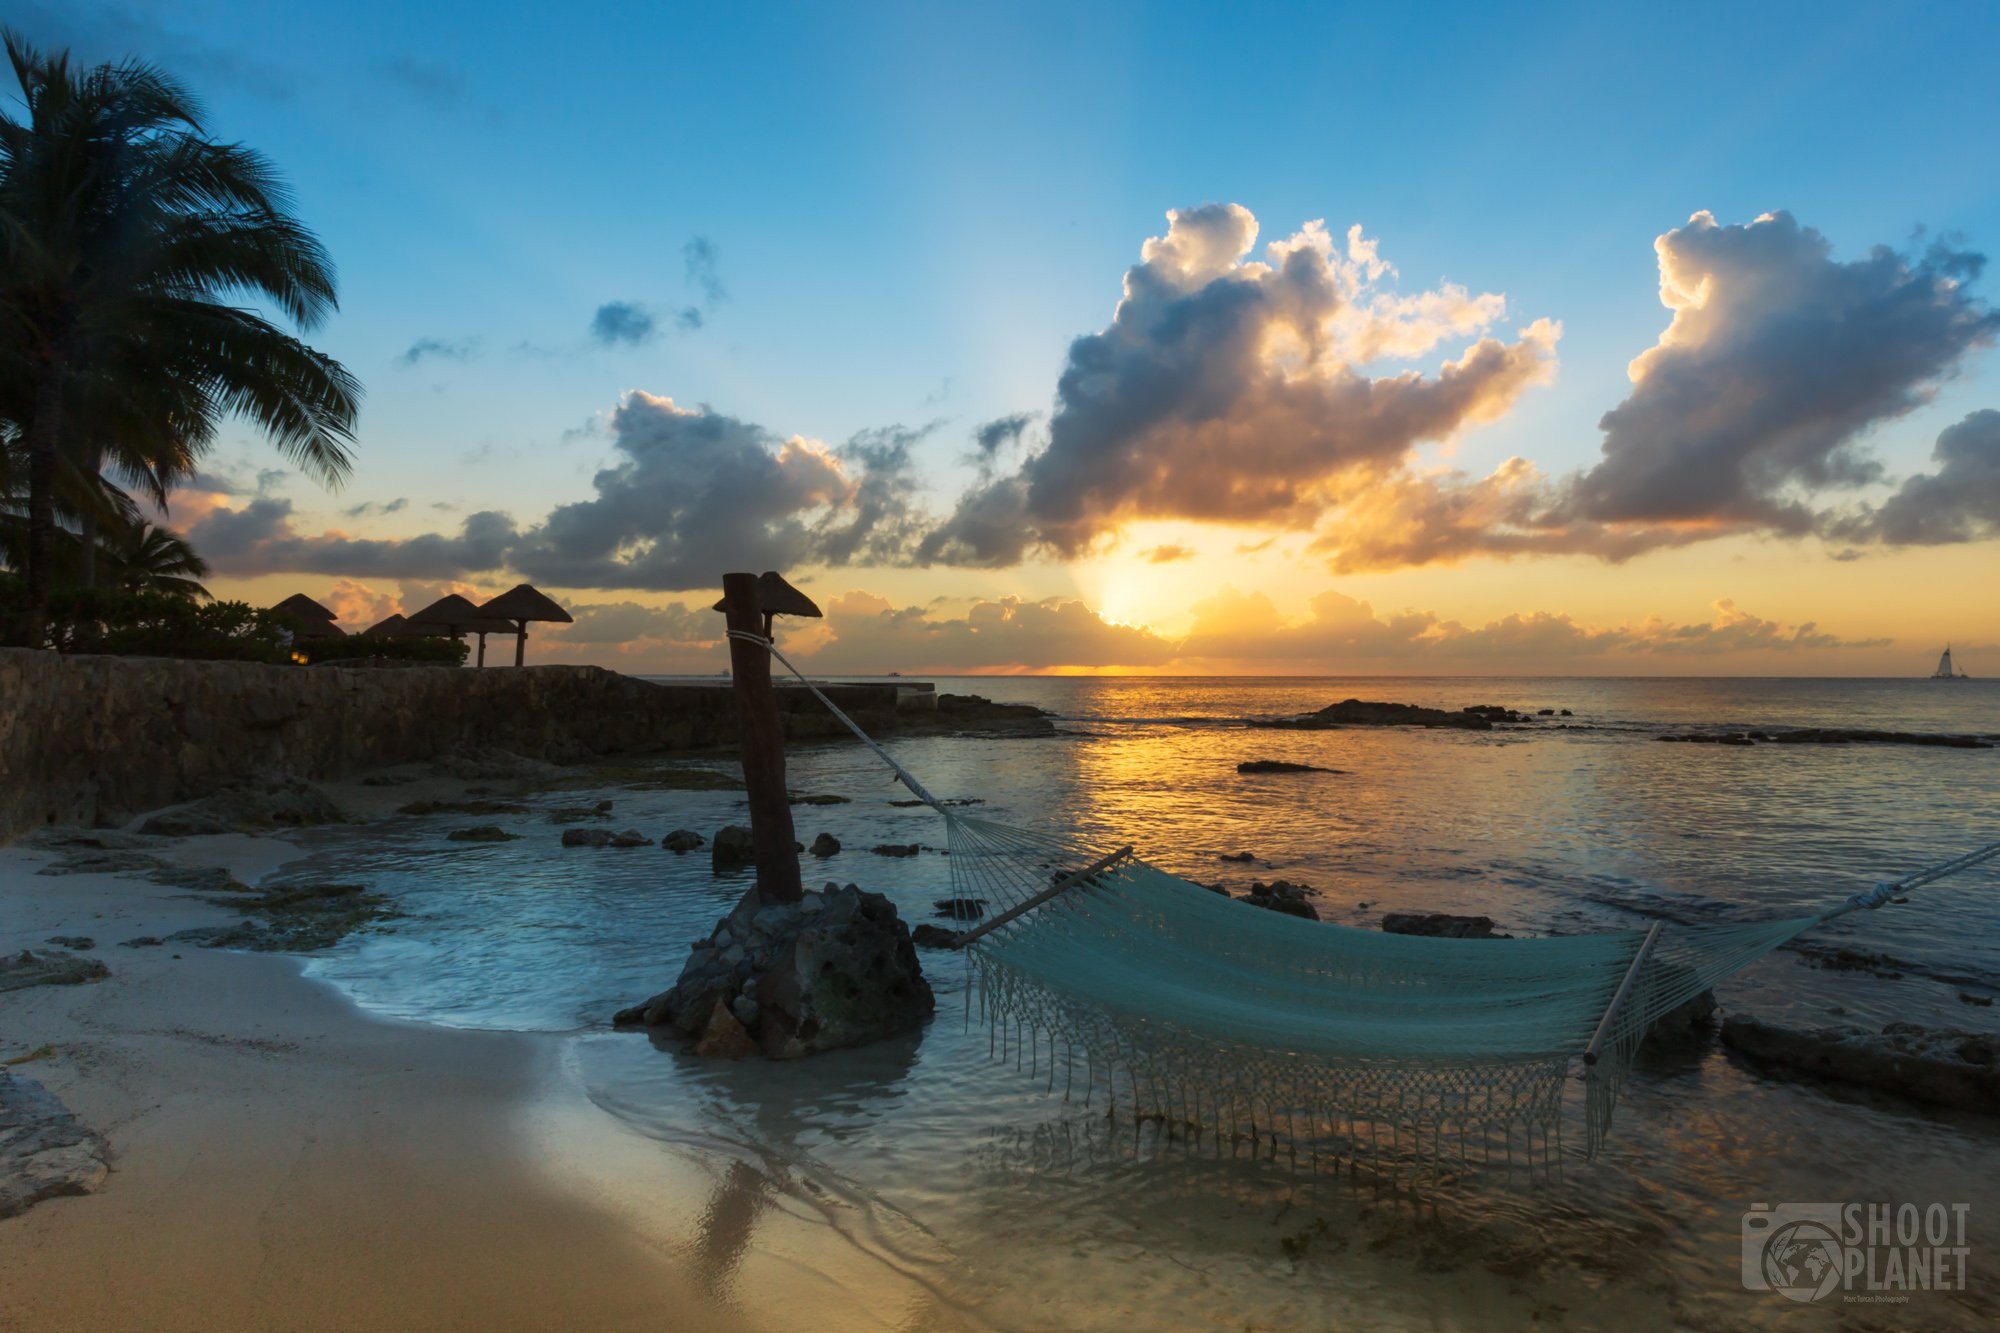 Hammock on the beach sunset, Cozumel, Mexico